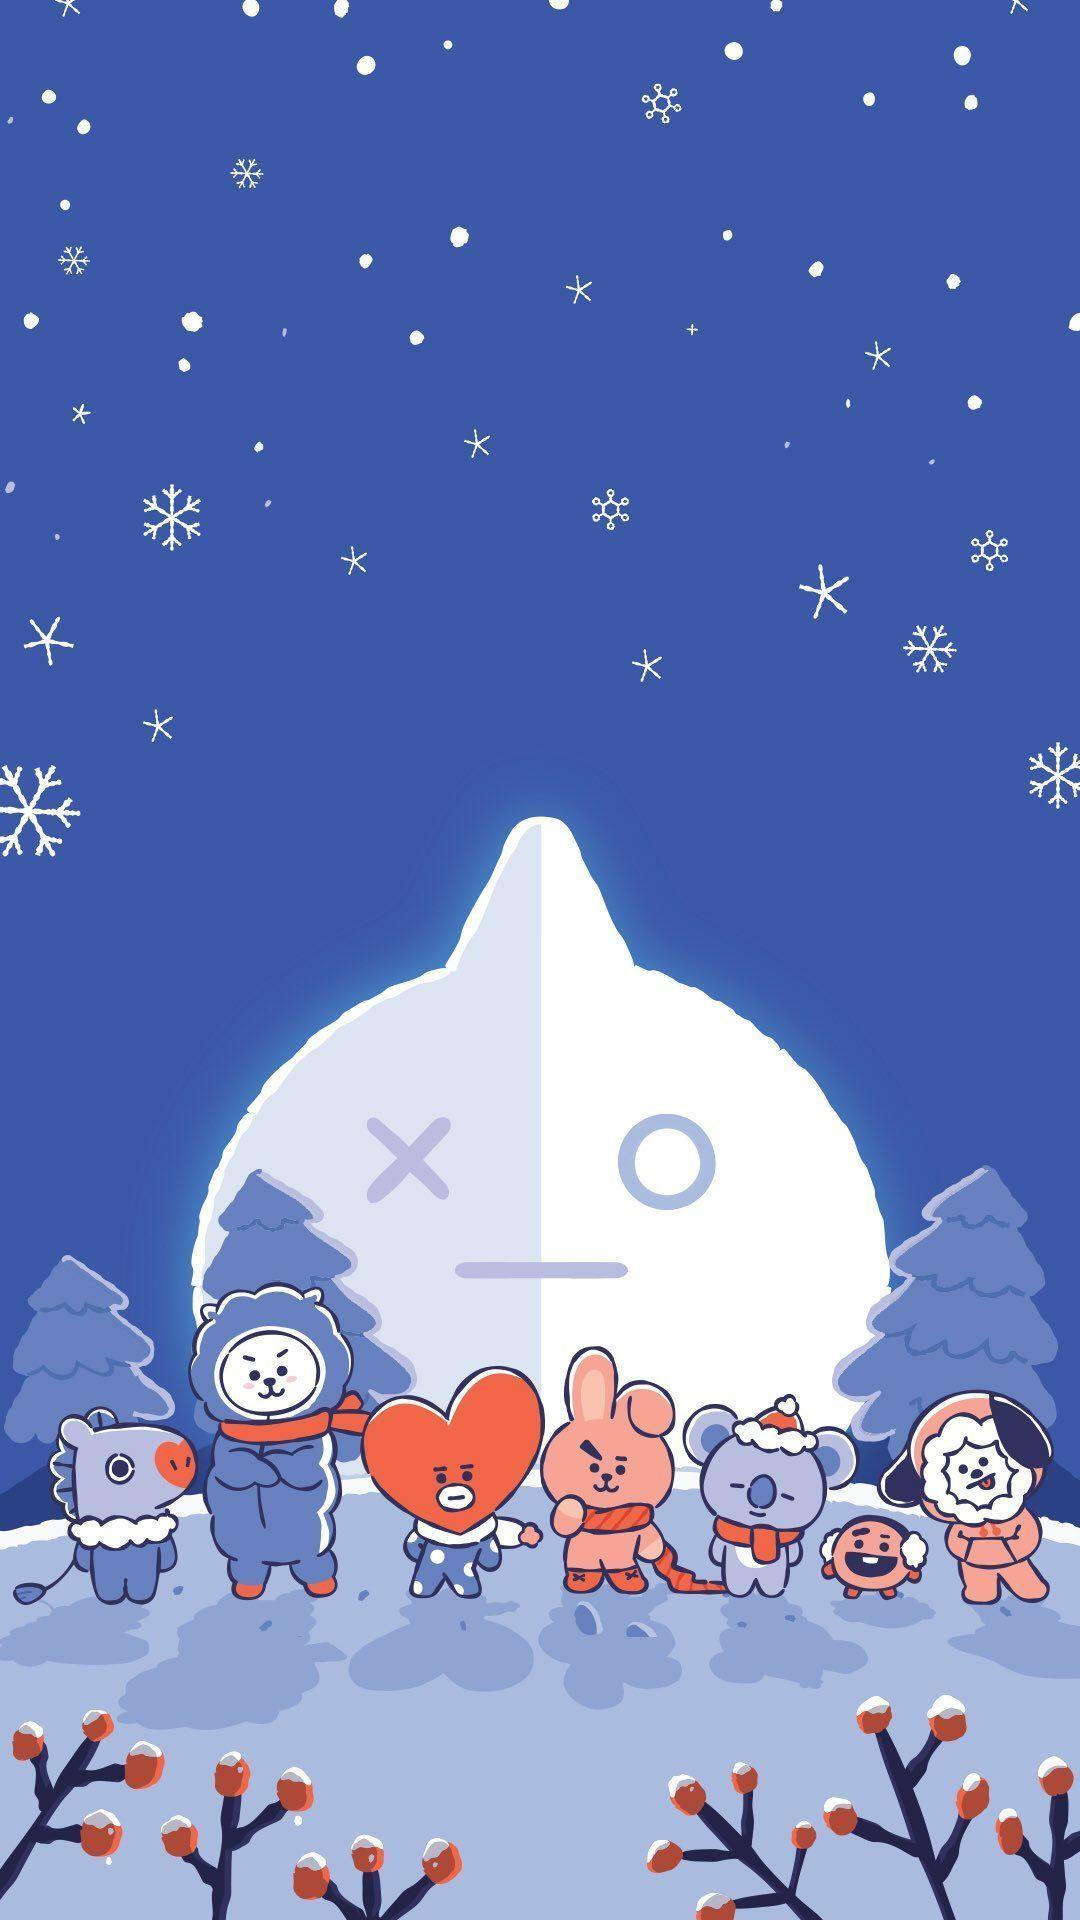 Van Koya Rj Shookie Mang Chimy Tata Cookie Fiksipenggemar Fiksi Penggemar Amreading Books Wattp Bts Christmas Wallpaper Iphone Christmas Bts Wallpaper Anime christmas iphone wallpaper